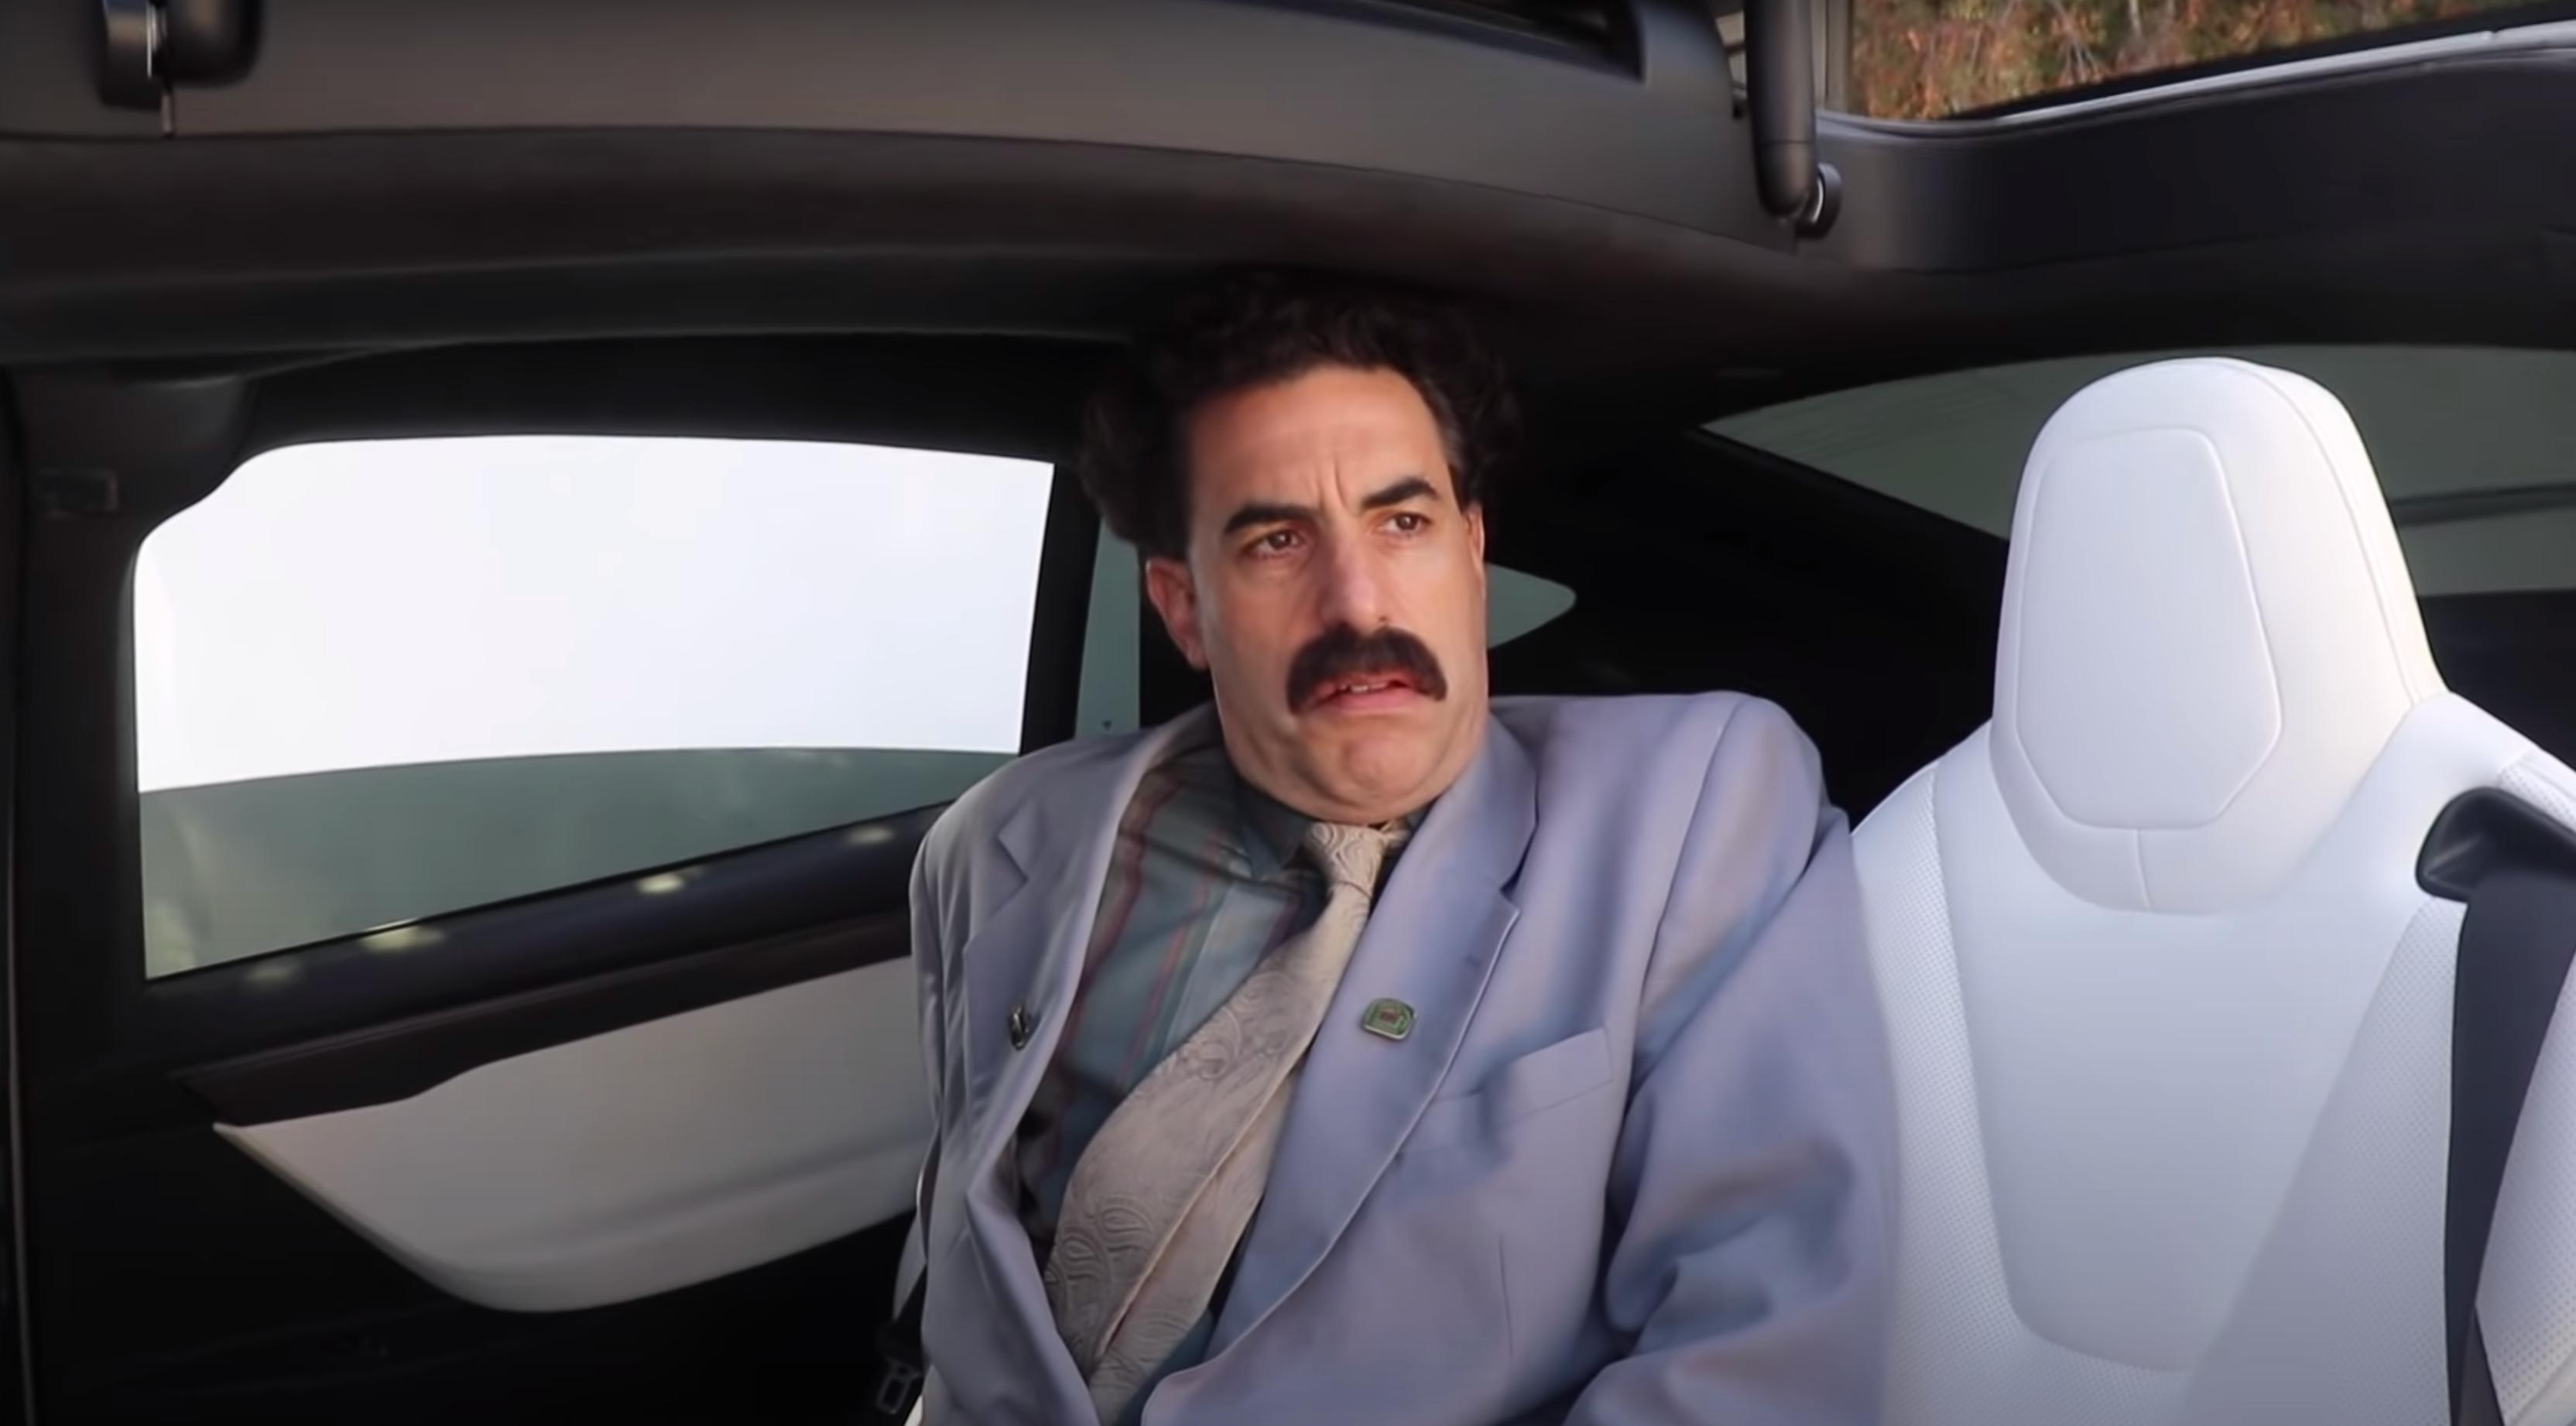 Youtube online watch borat [WATCH] Borat